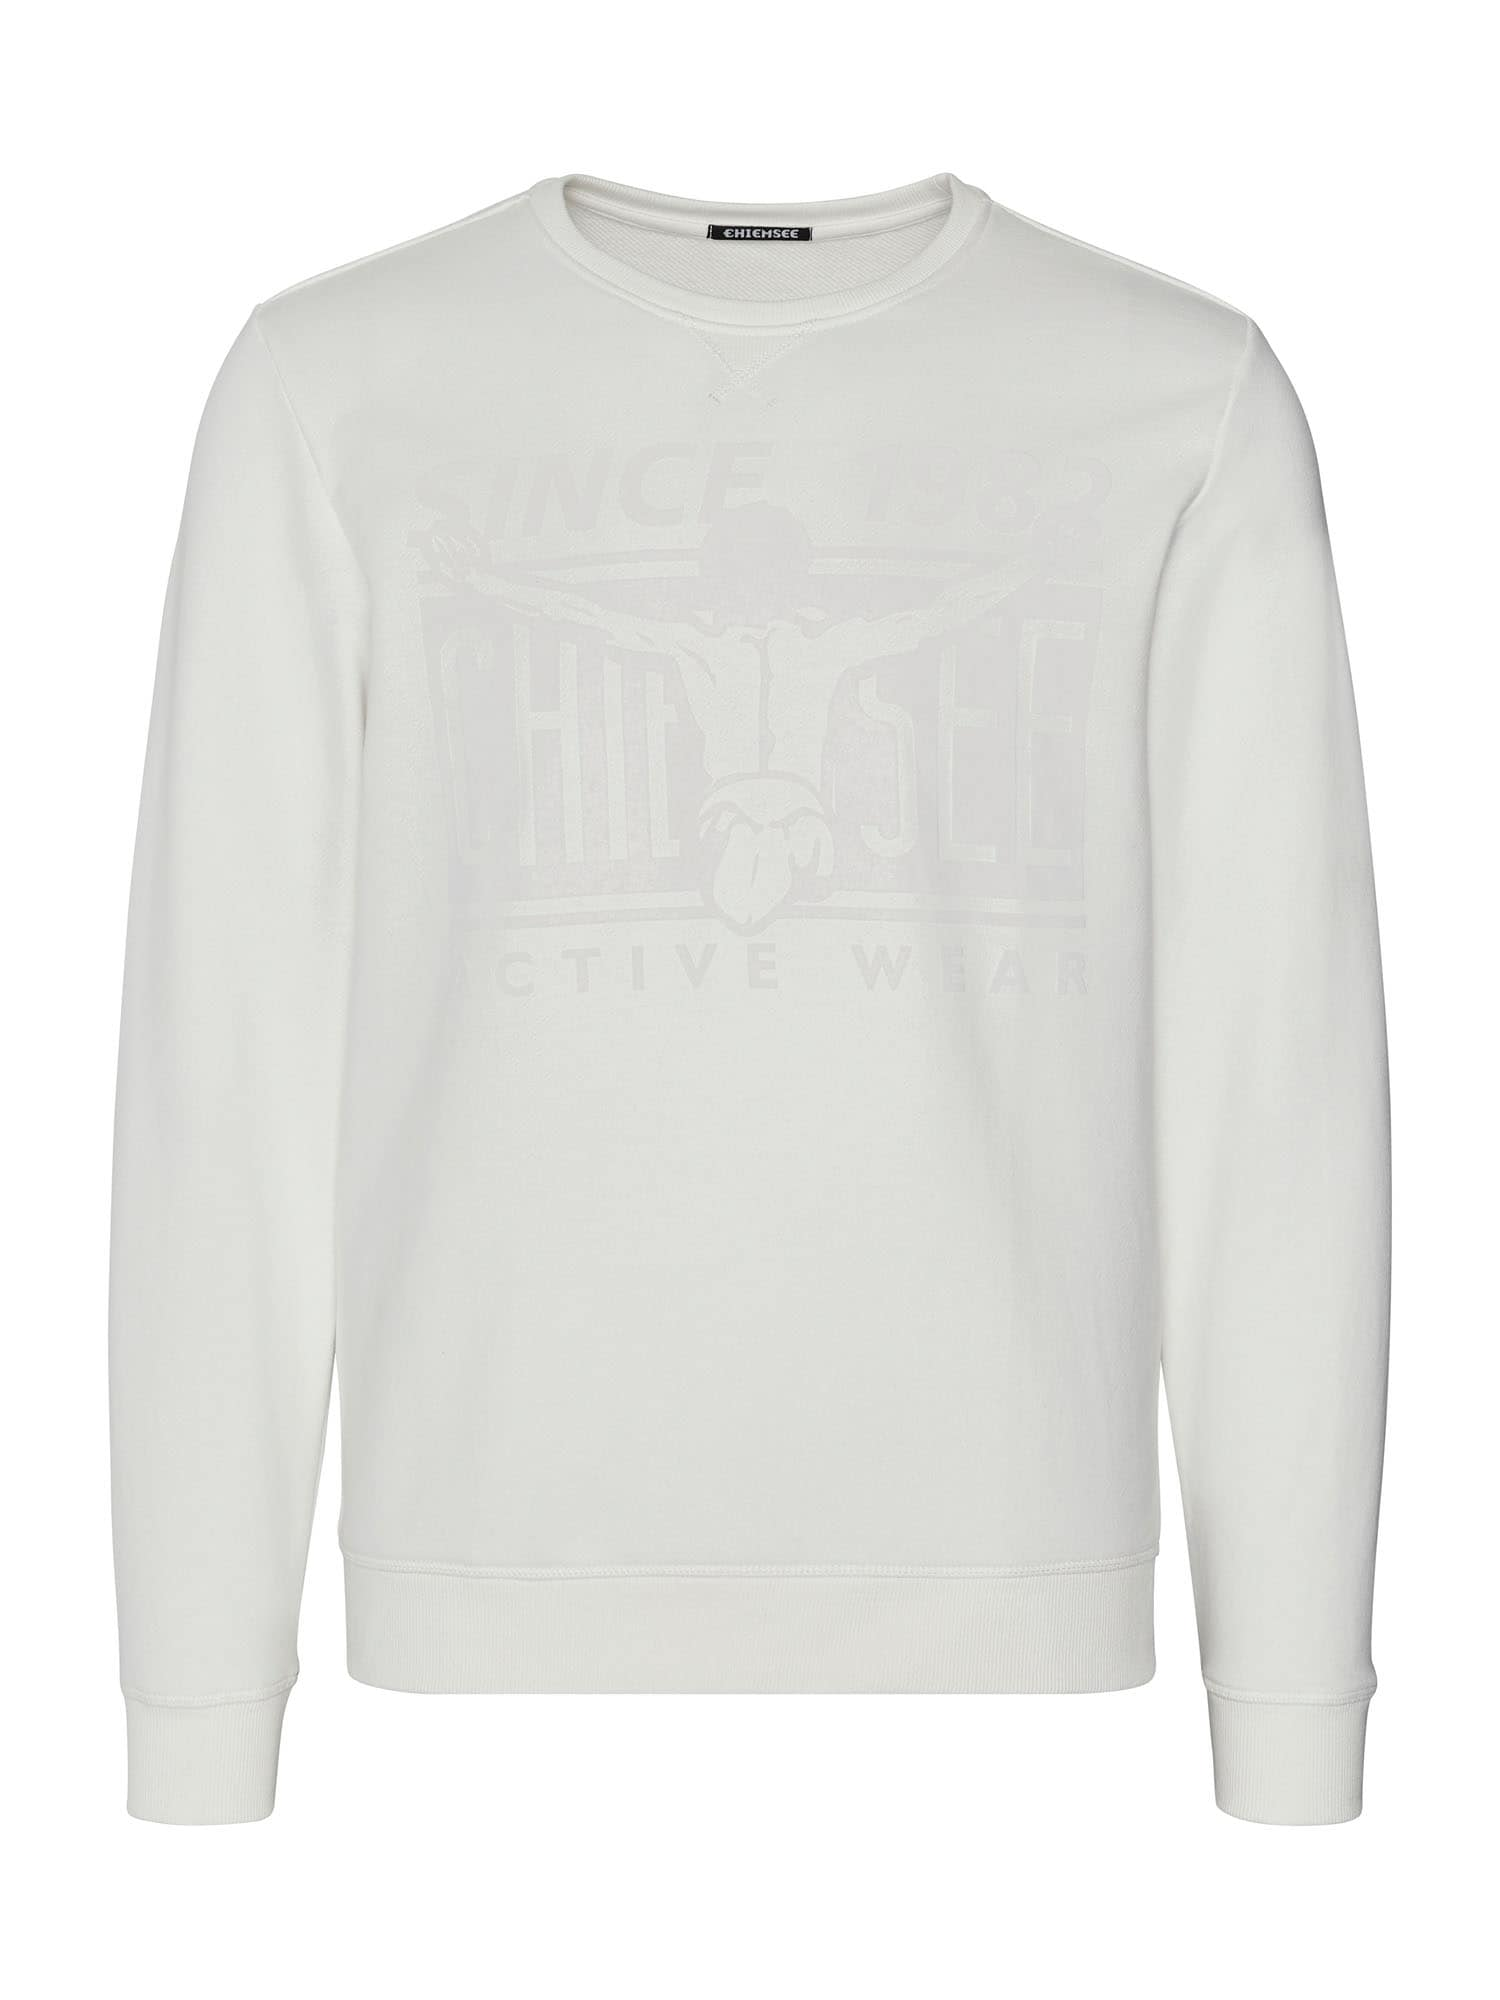 CHIEMSEE Sportinio tipo megztinis balta